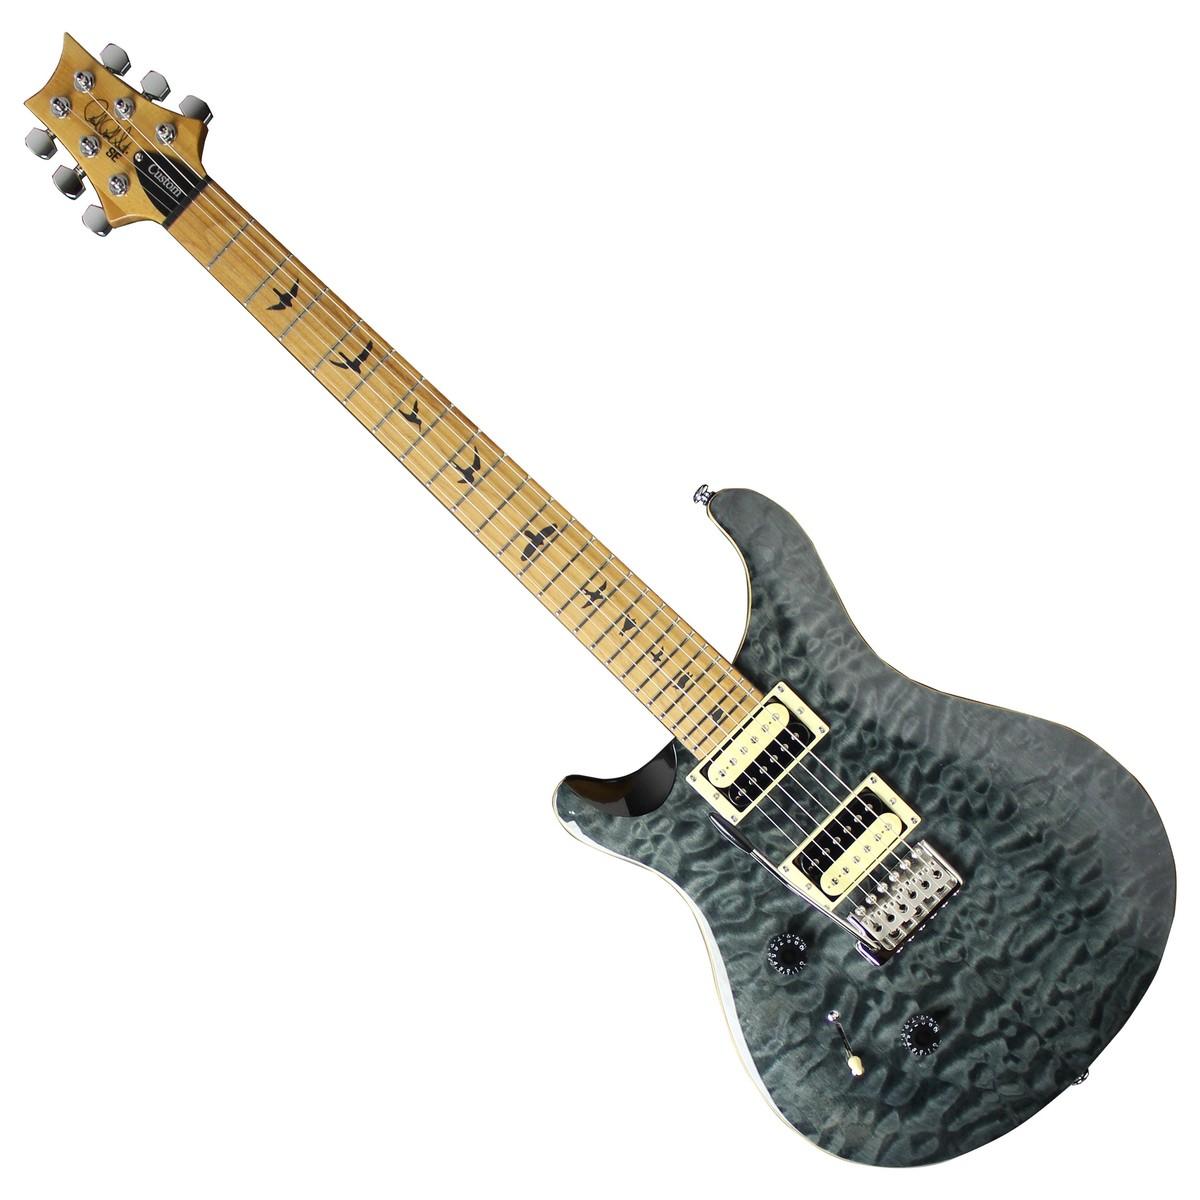 Prs Se Custom 24 Roasted Maple Neck Left Handed Grey Black At Gear4music